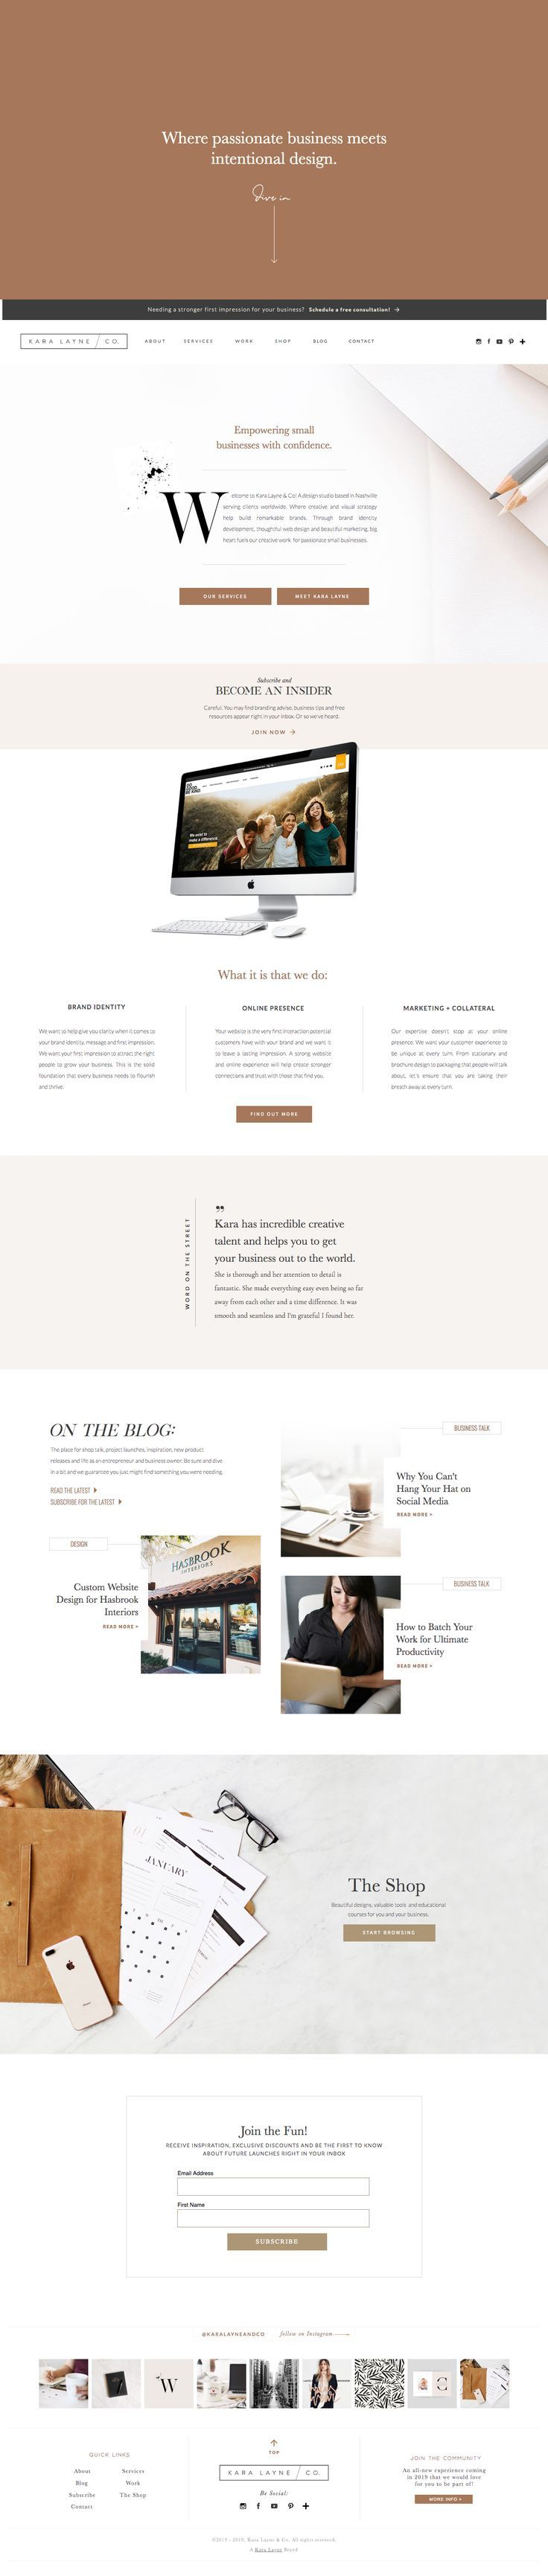 Website Design Inspo Web Development Design Web Design Portfolio Web Design